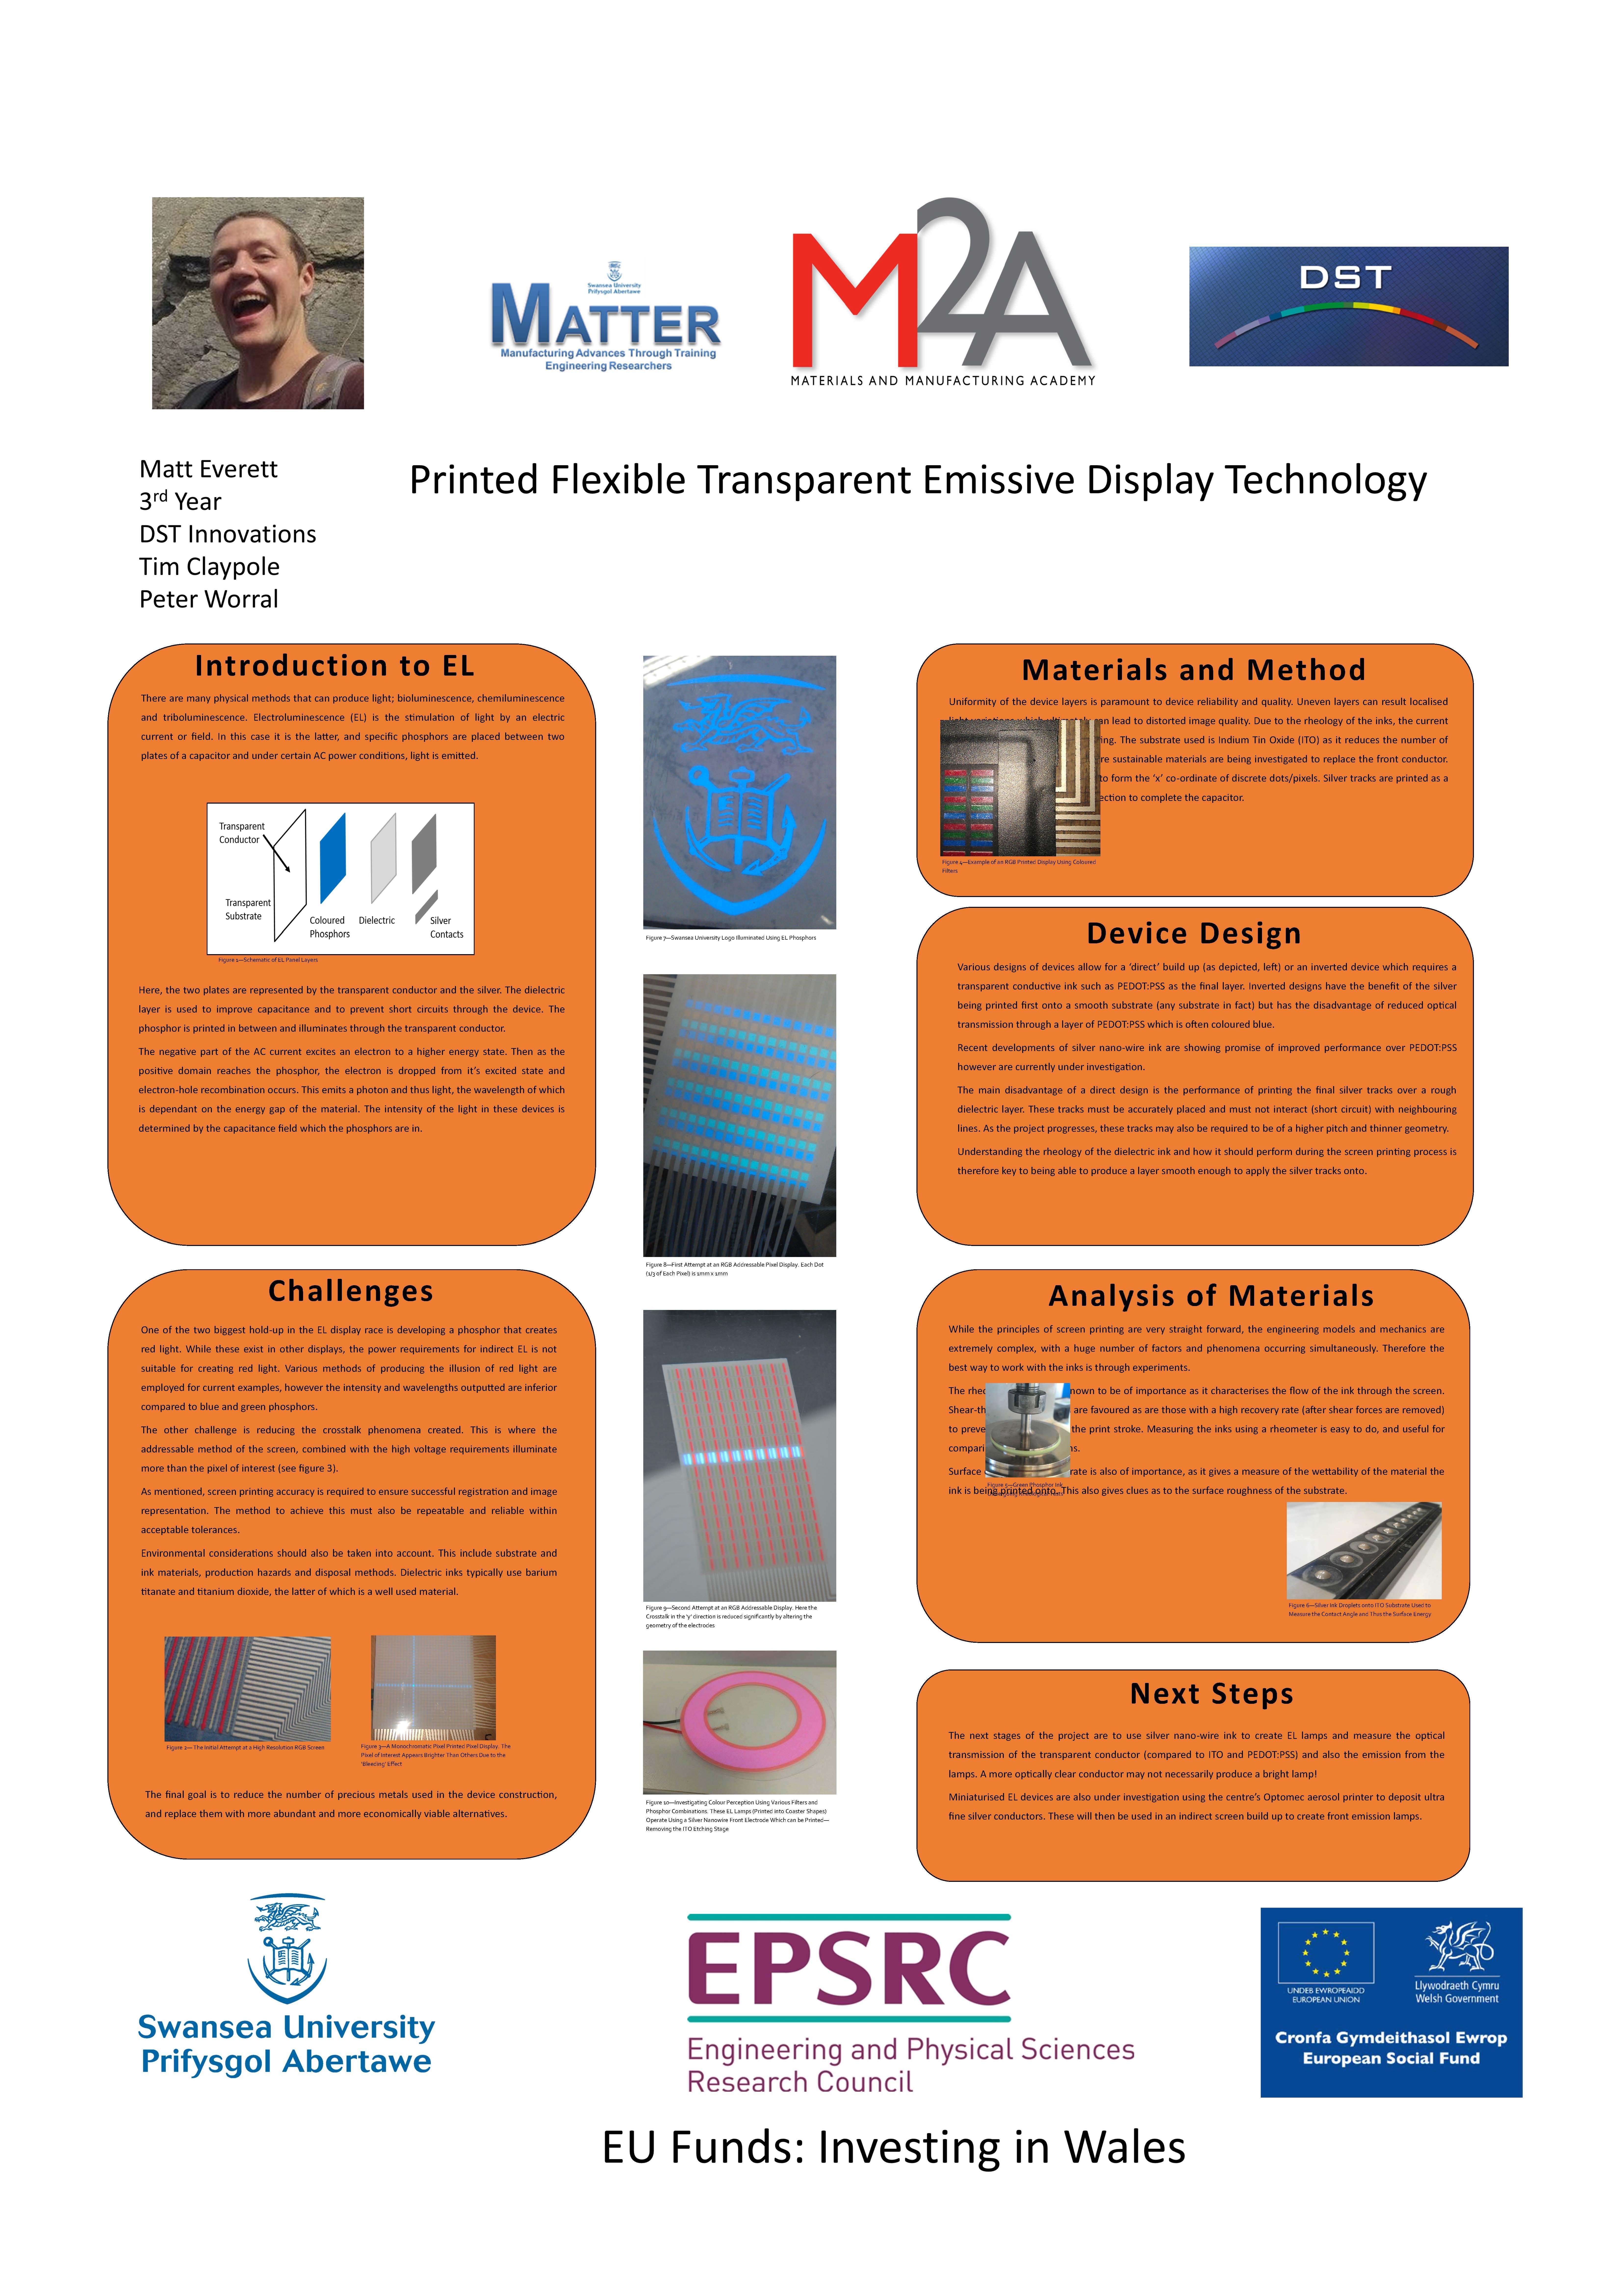 Printed Flexible Transparent Emissive Display Technology